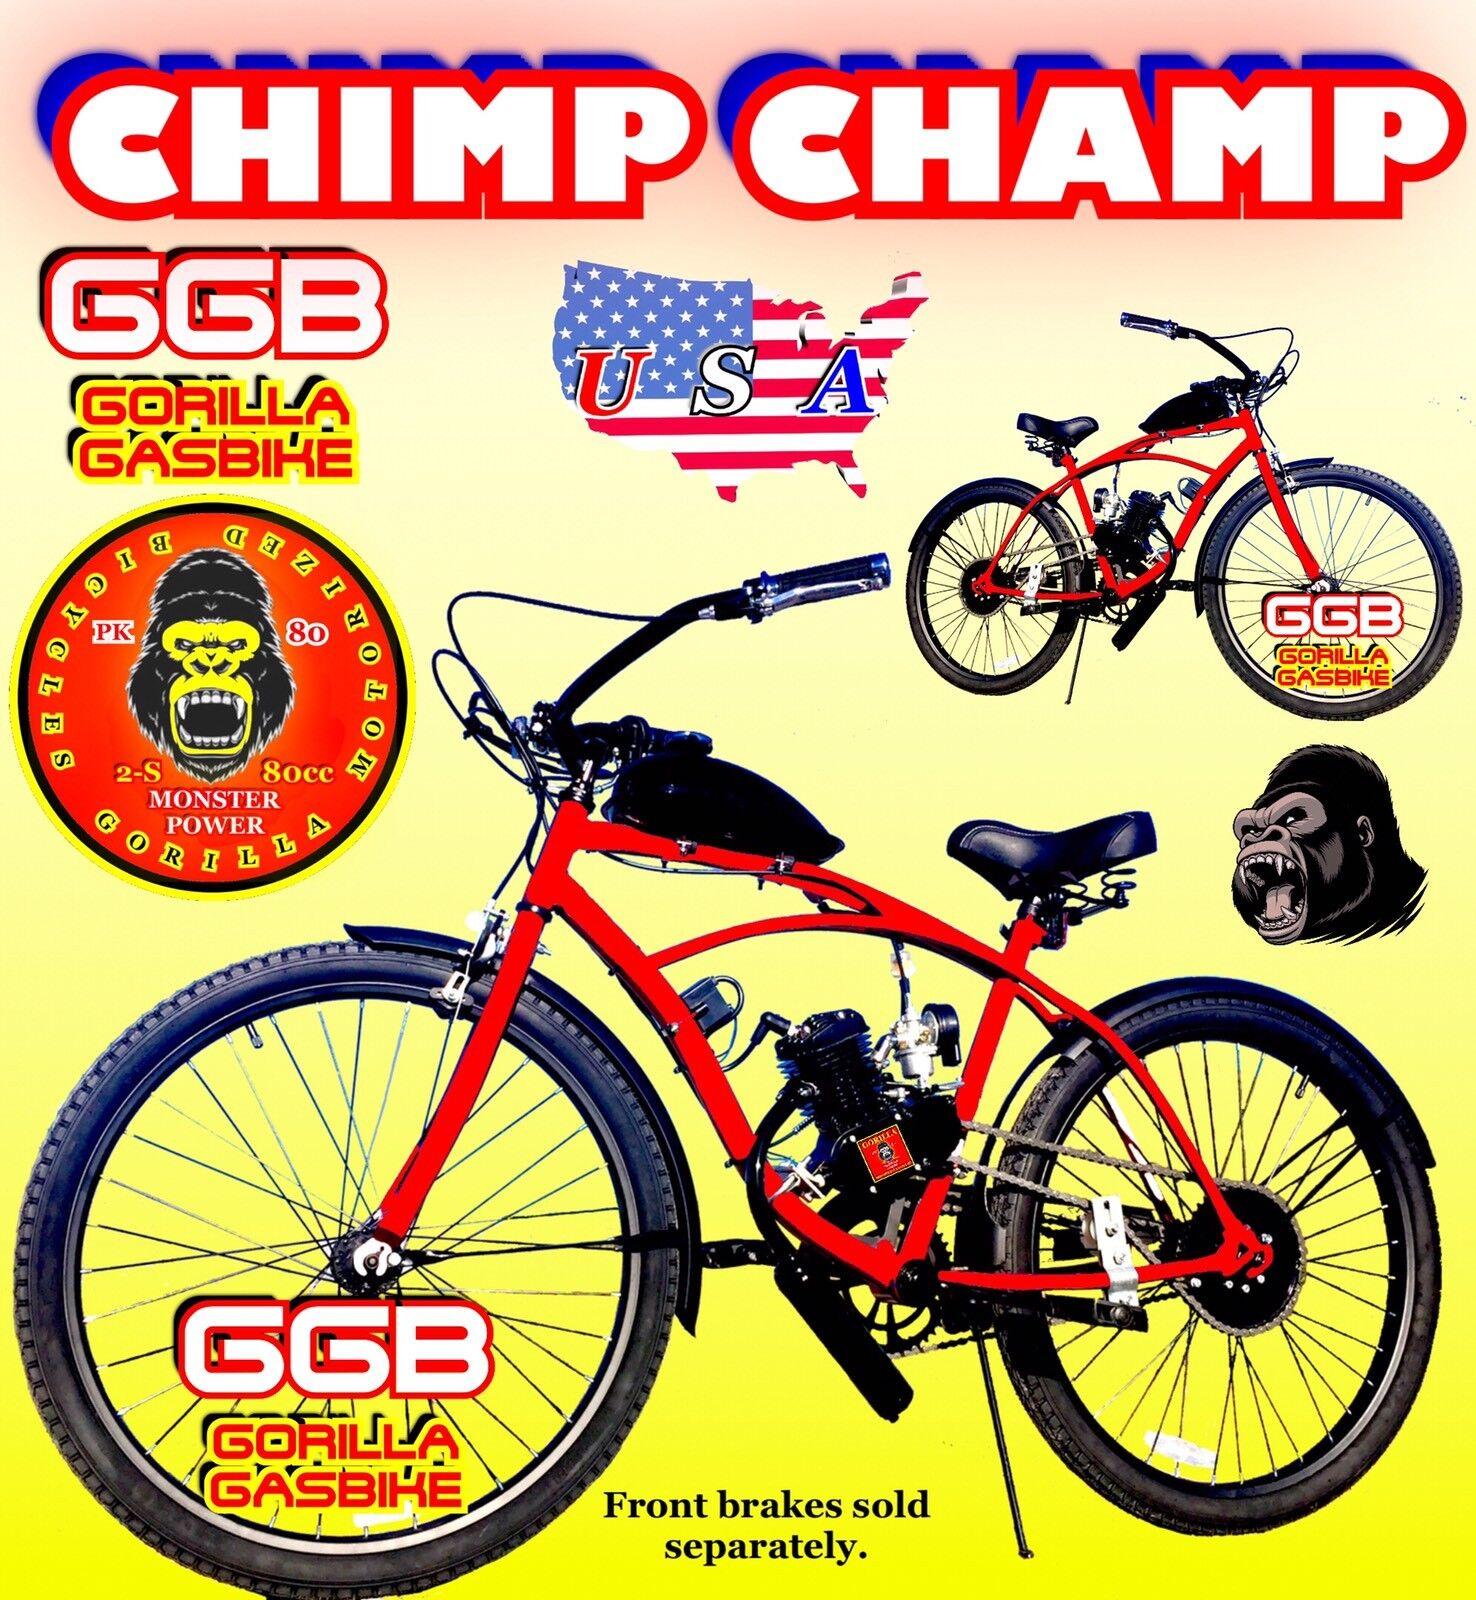 66cc 80cc 2-stroke motorized bike Kit And 26  Cruiser Bike Motor Bike Kit moped